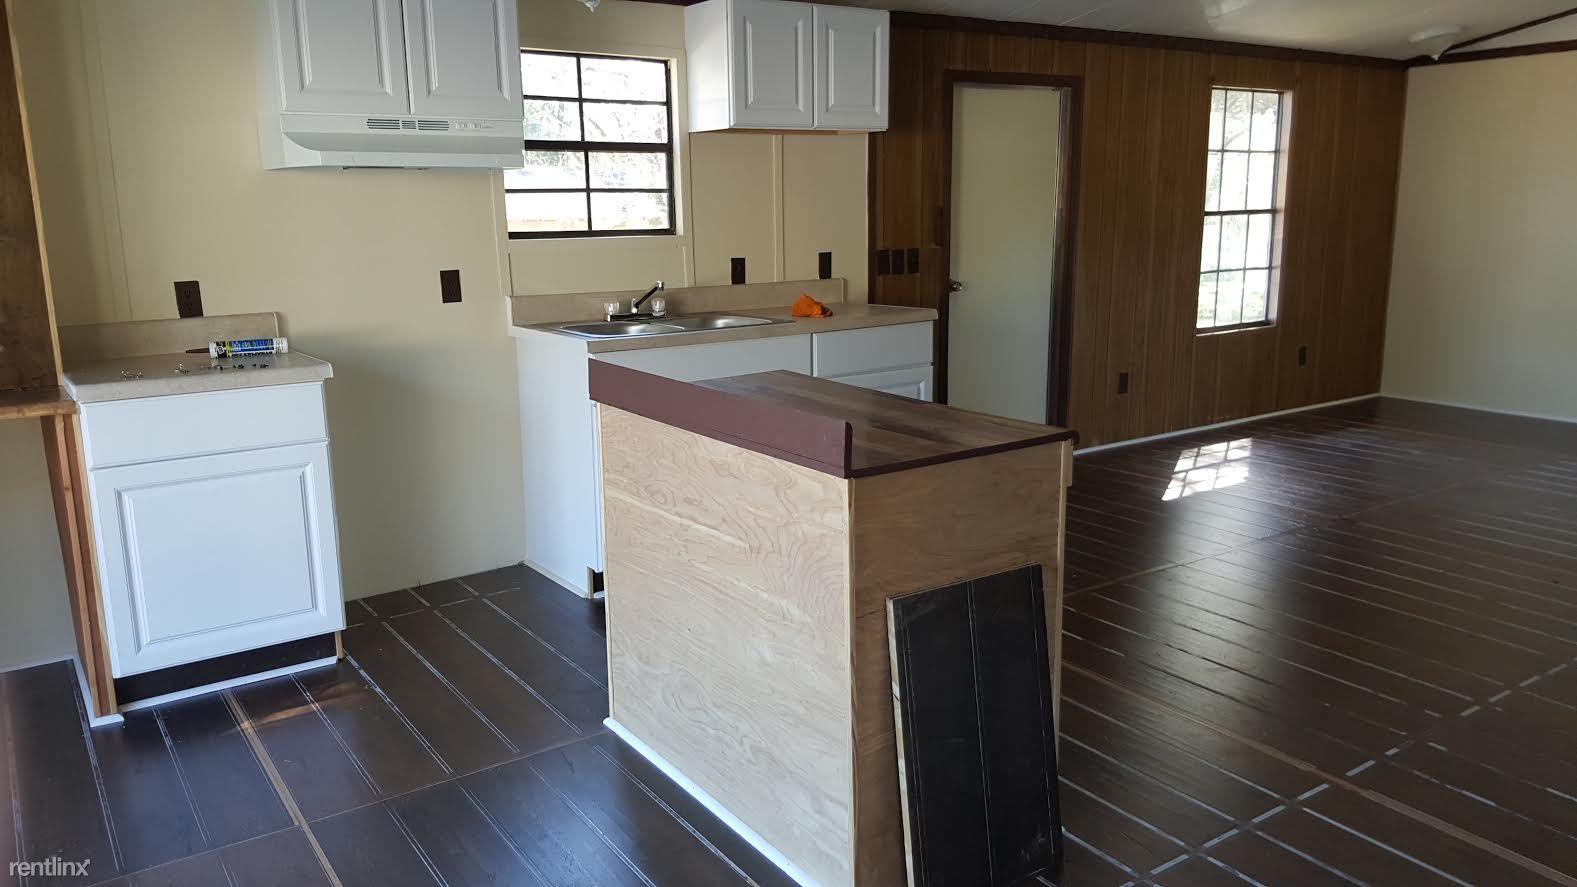 $650 - $750 per month , Toby Ln & Hazen Ave,